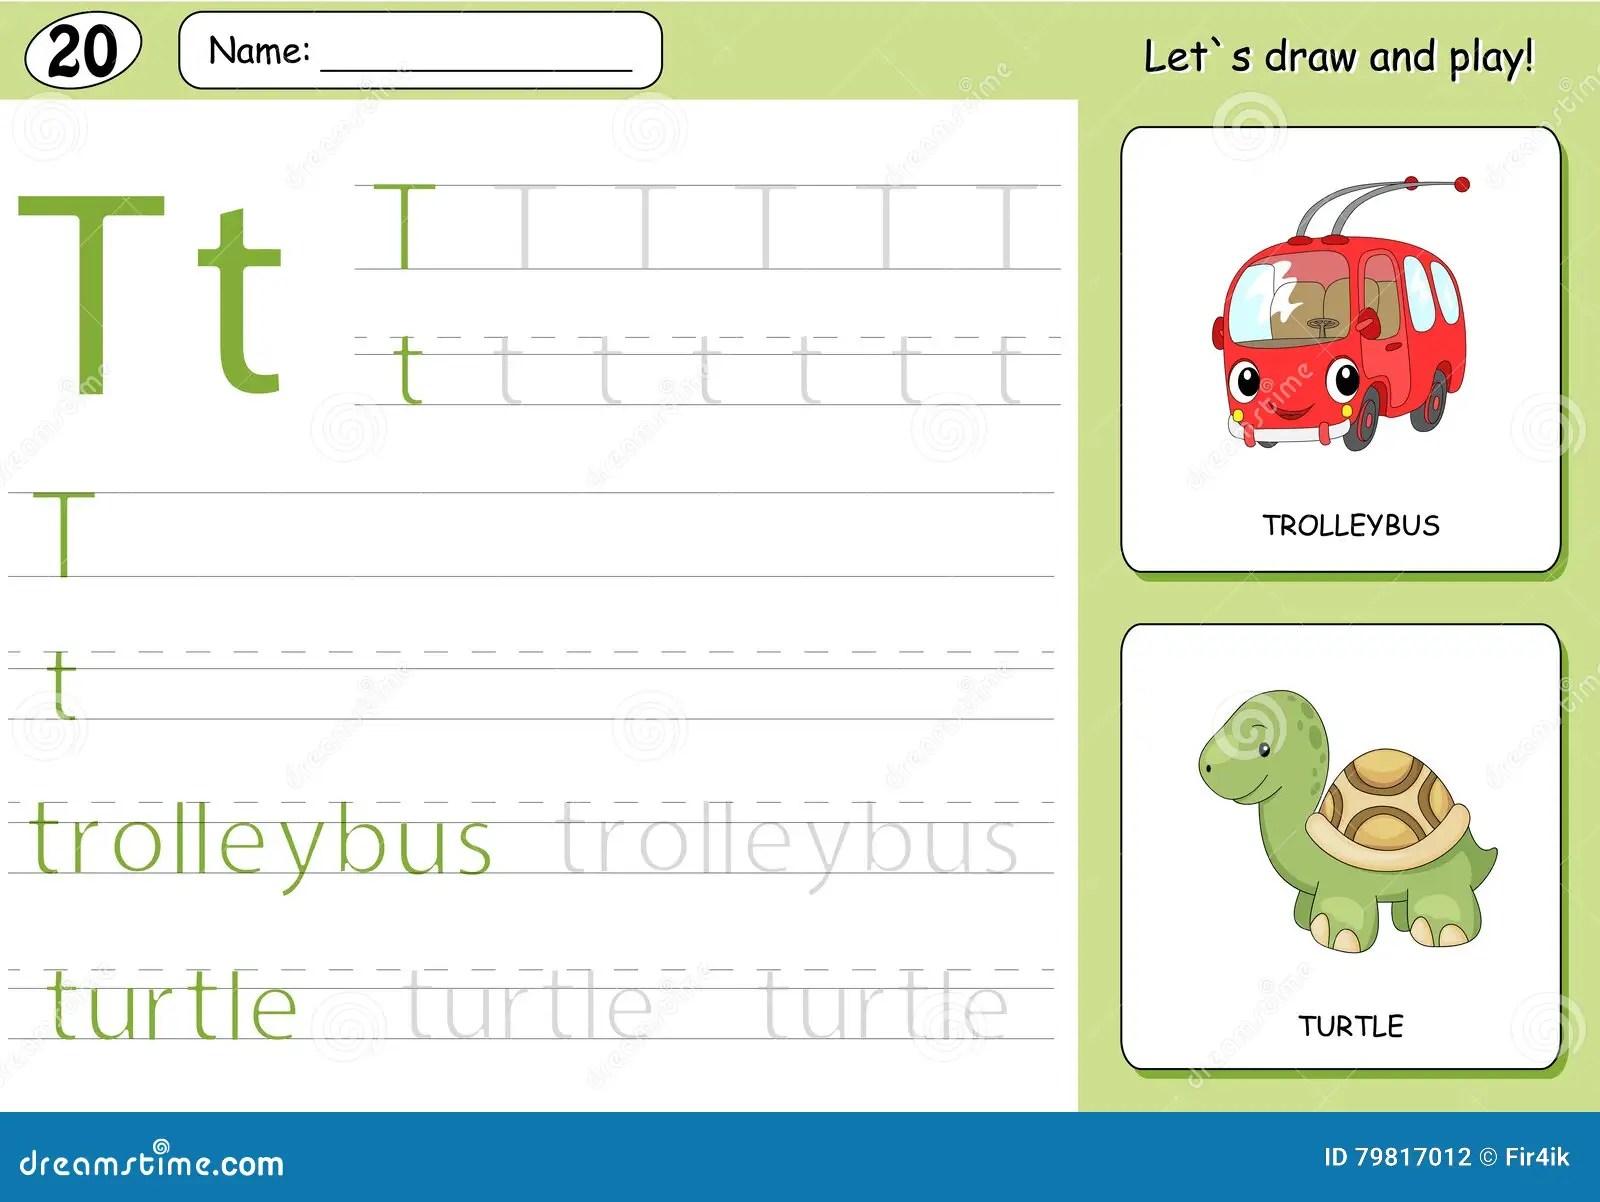 Cartoon Trolleybus And Turtle Alphabet Tracing Worksheet